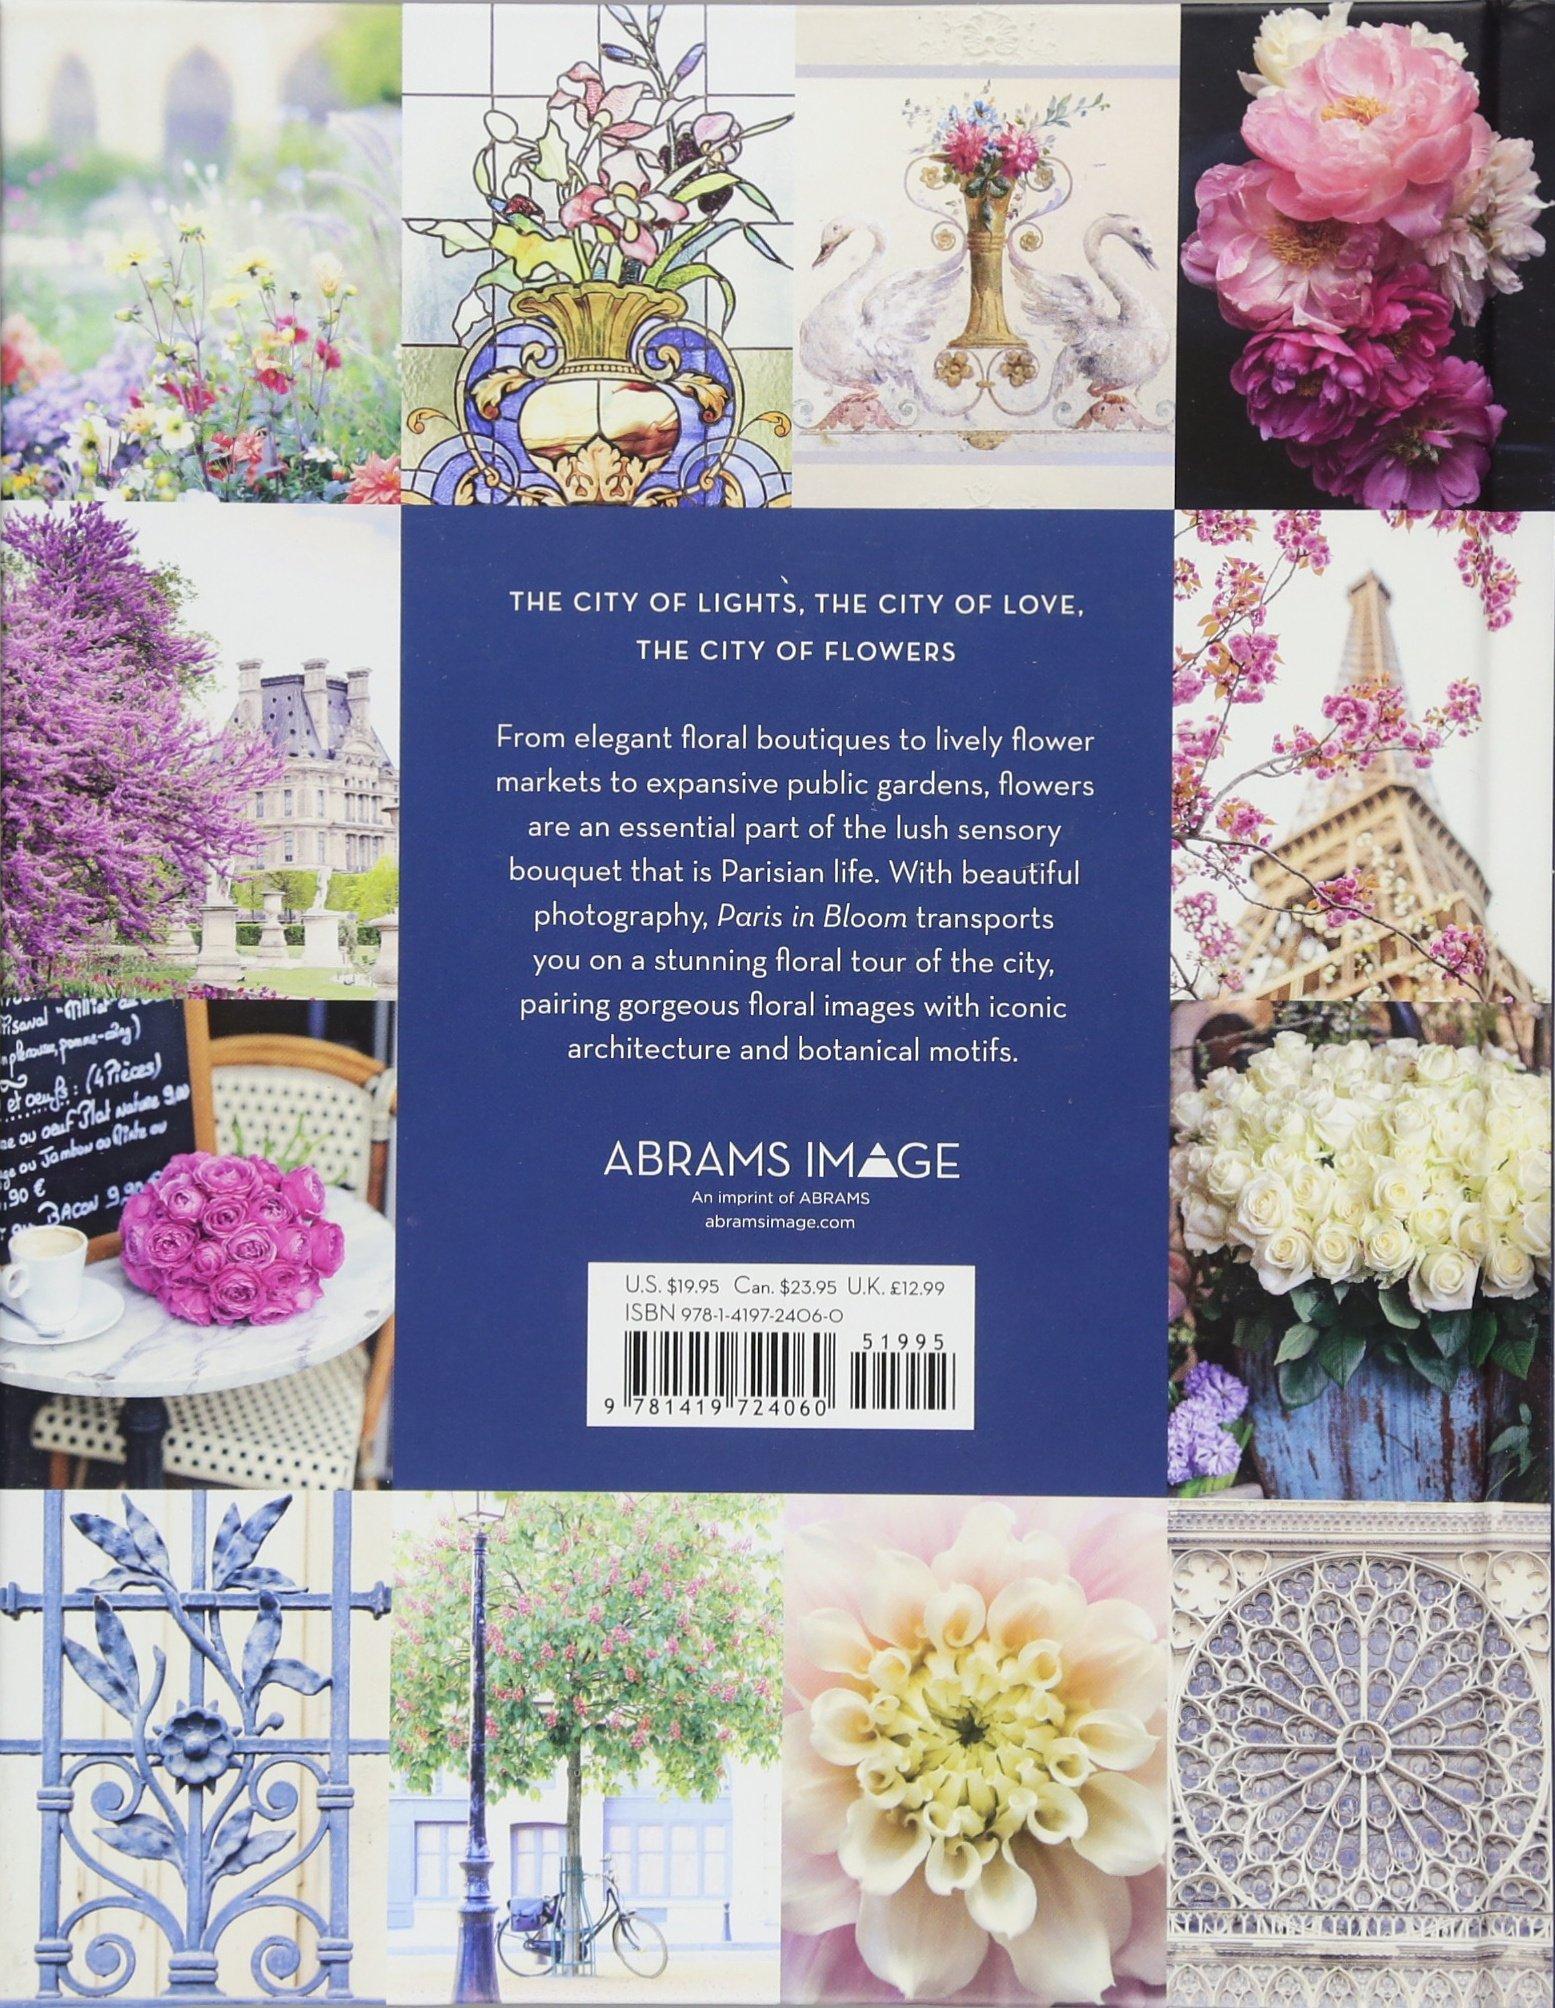 Paris in bloom georgianna lane 9781419724060 amazon books izmirmasajfo